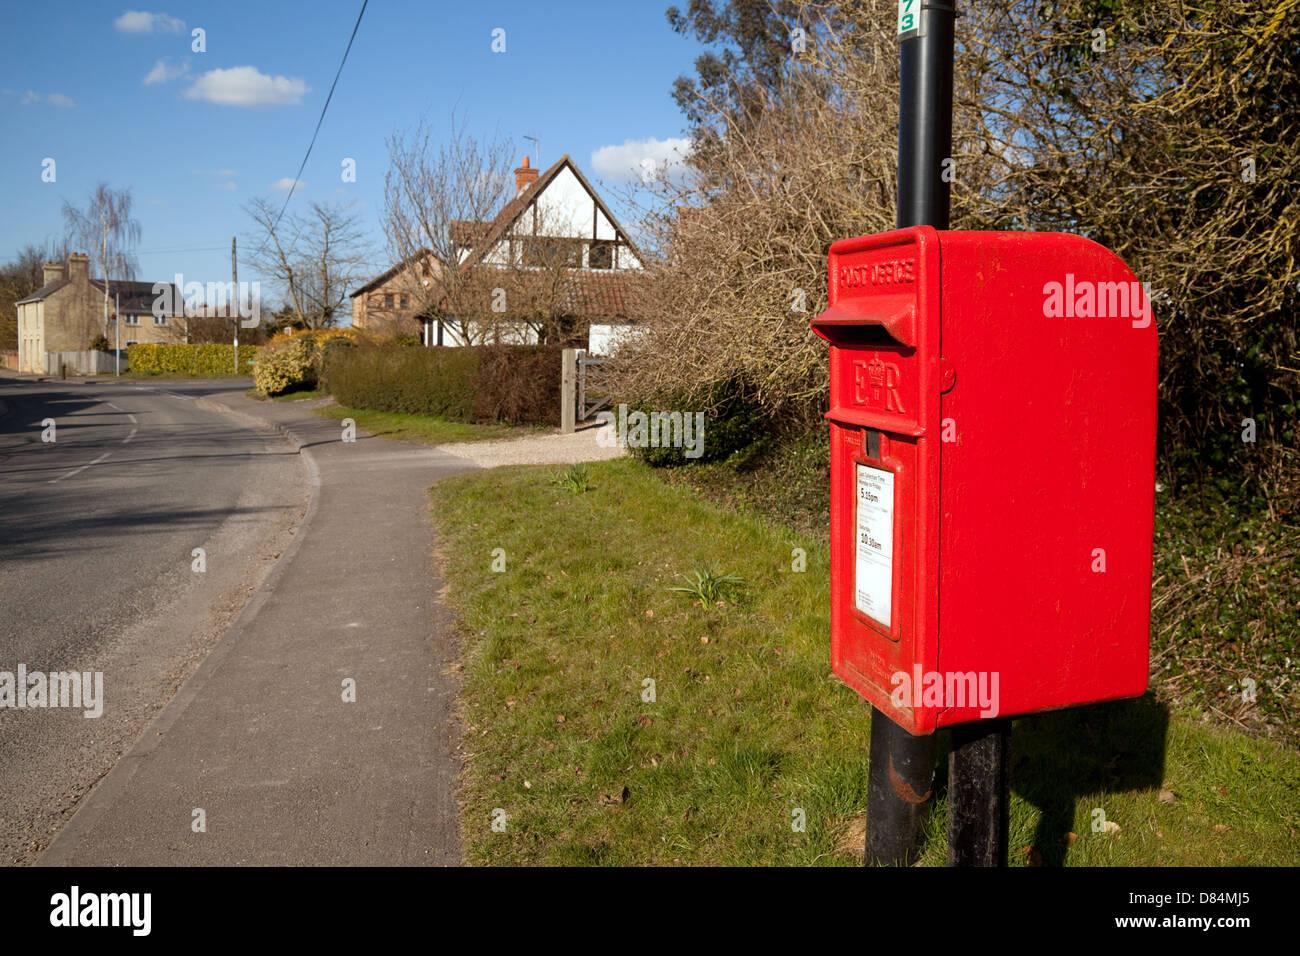 A red Village royal mail postbox mailbox, Swaffham Prior, Cambridgeshire UK - Stock Image